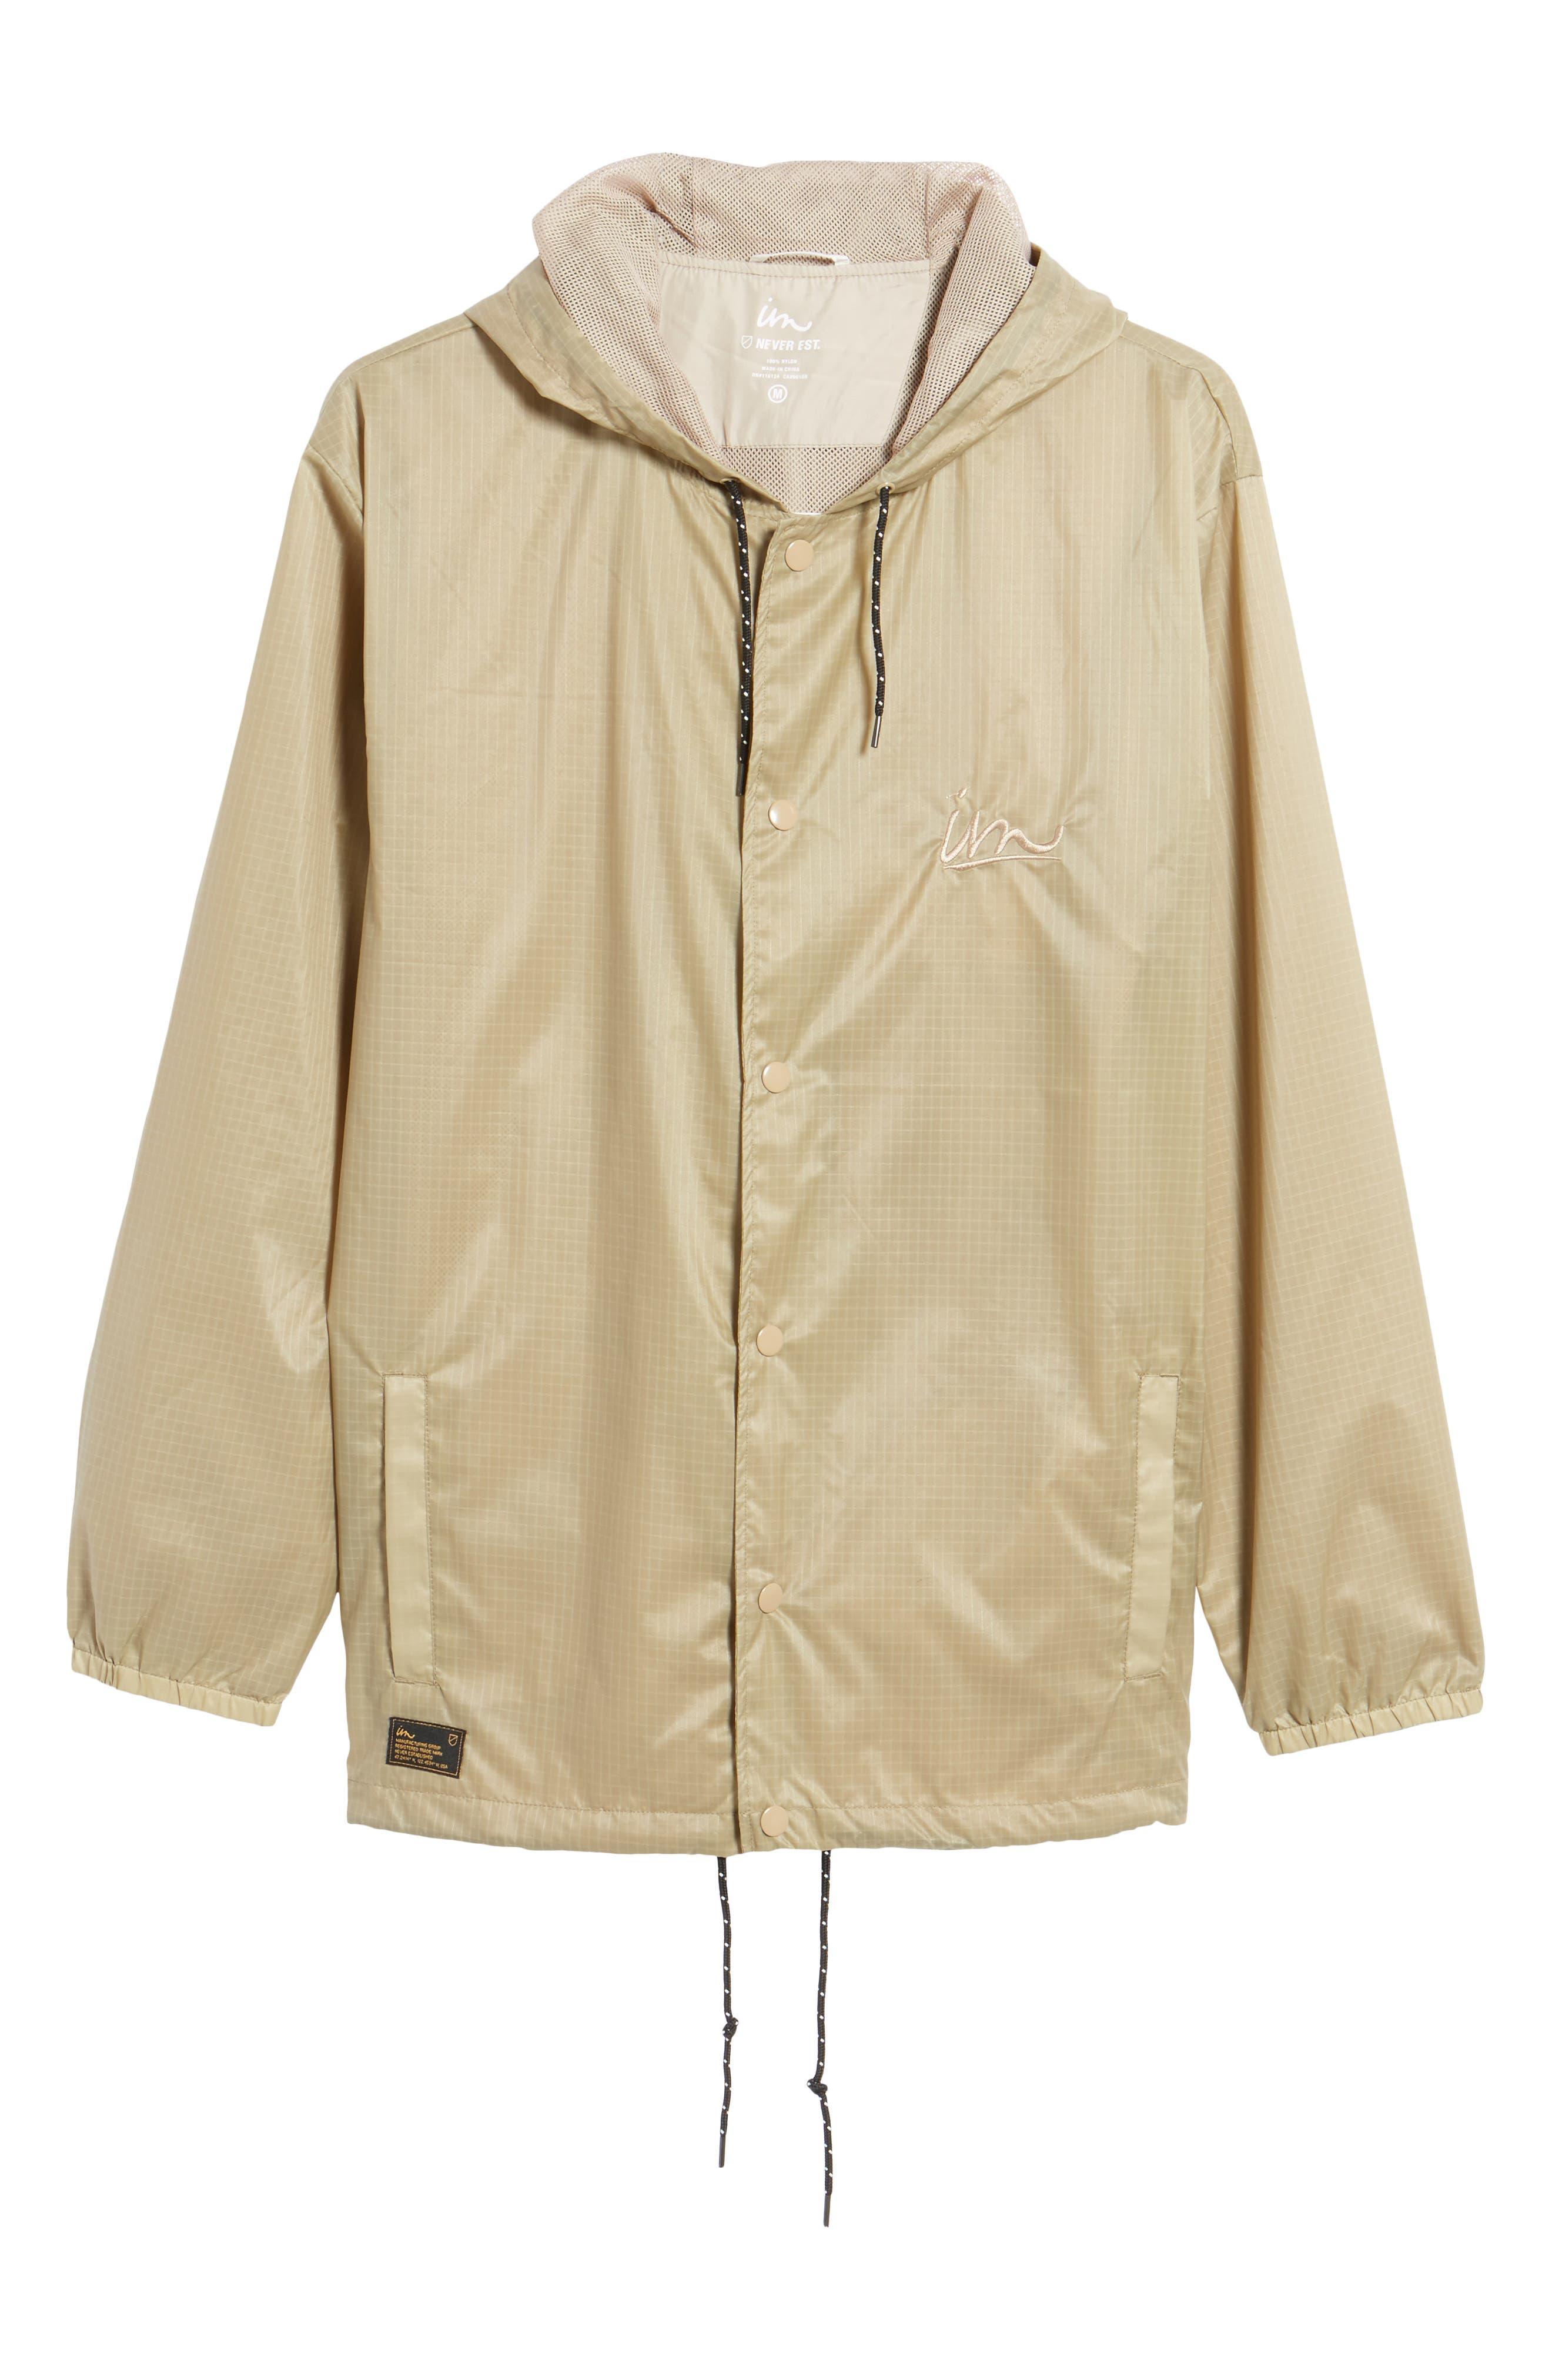 NCT Vulcan Coach's Jacket,                             Alternate thumbnail 10, color,